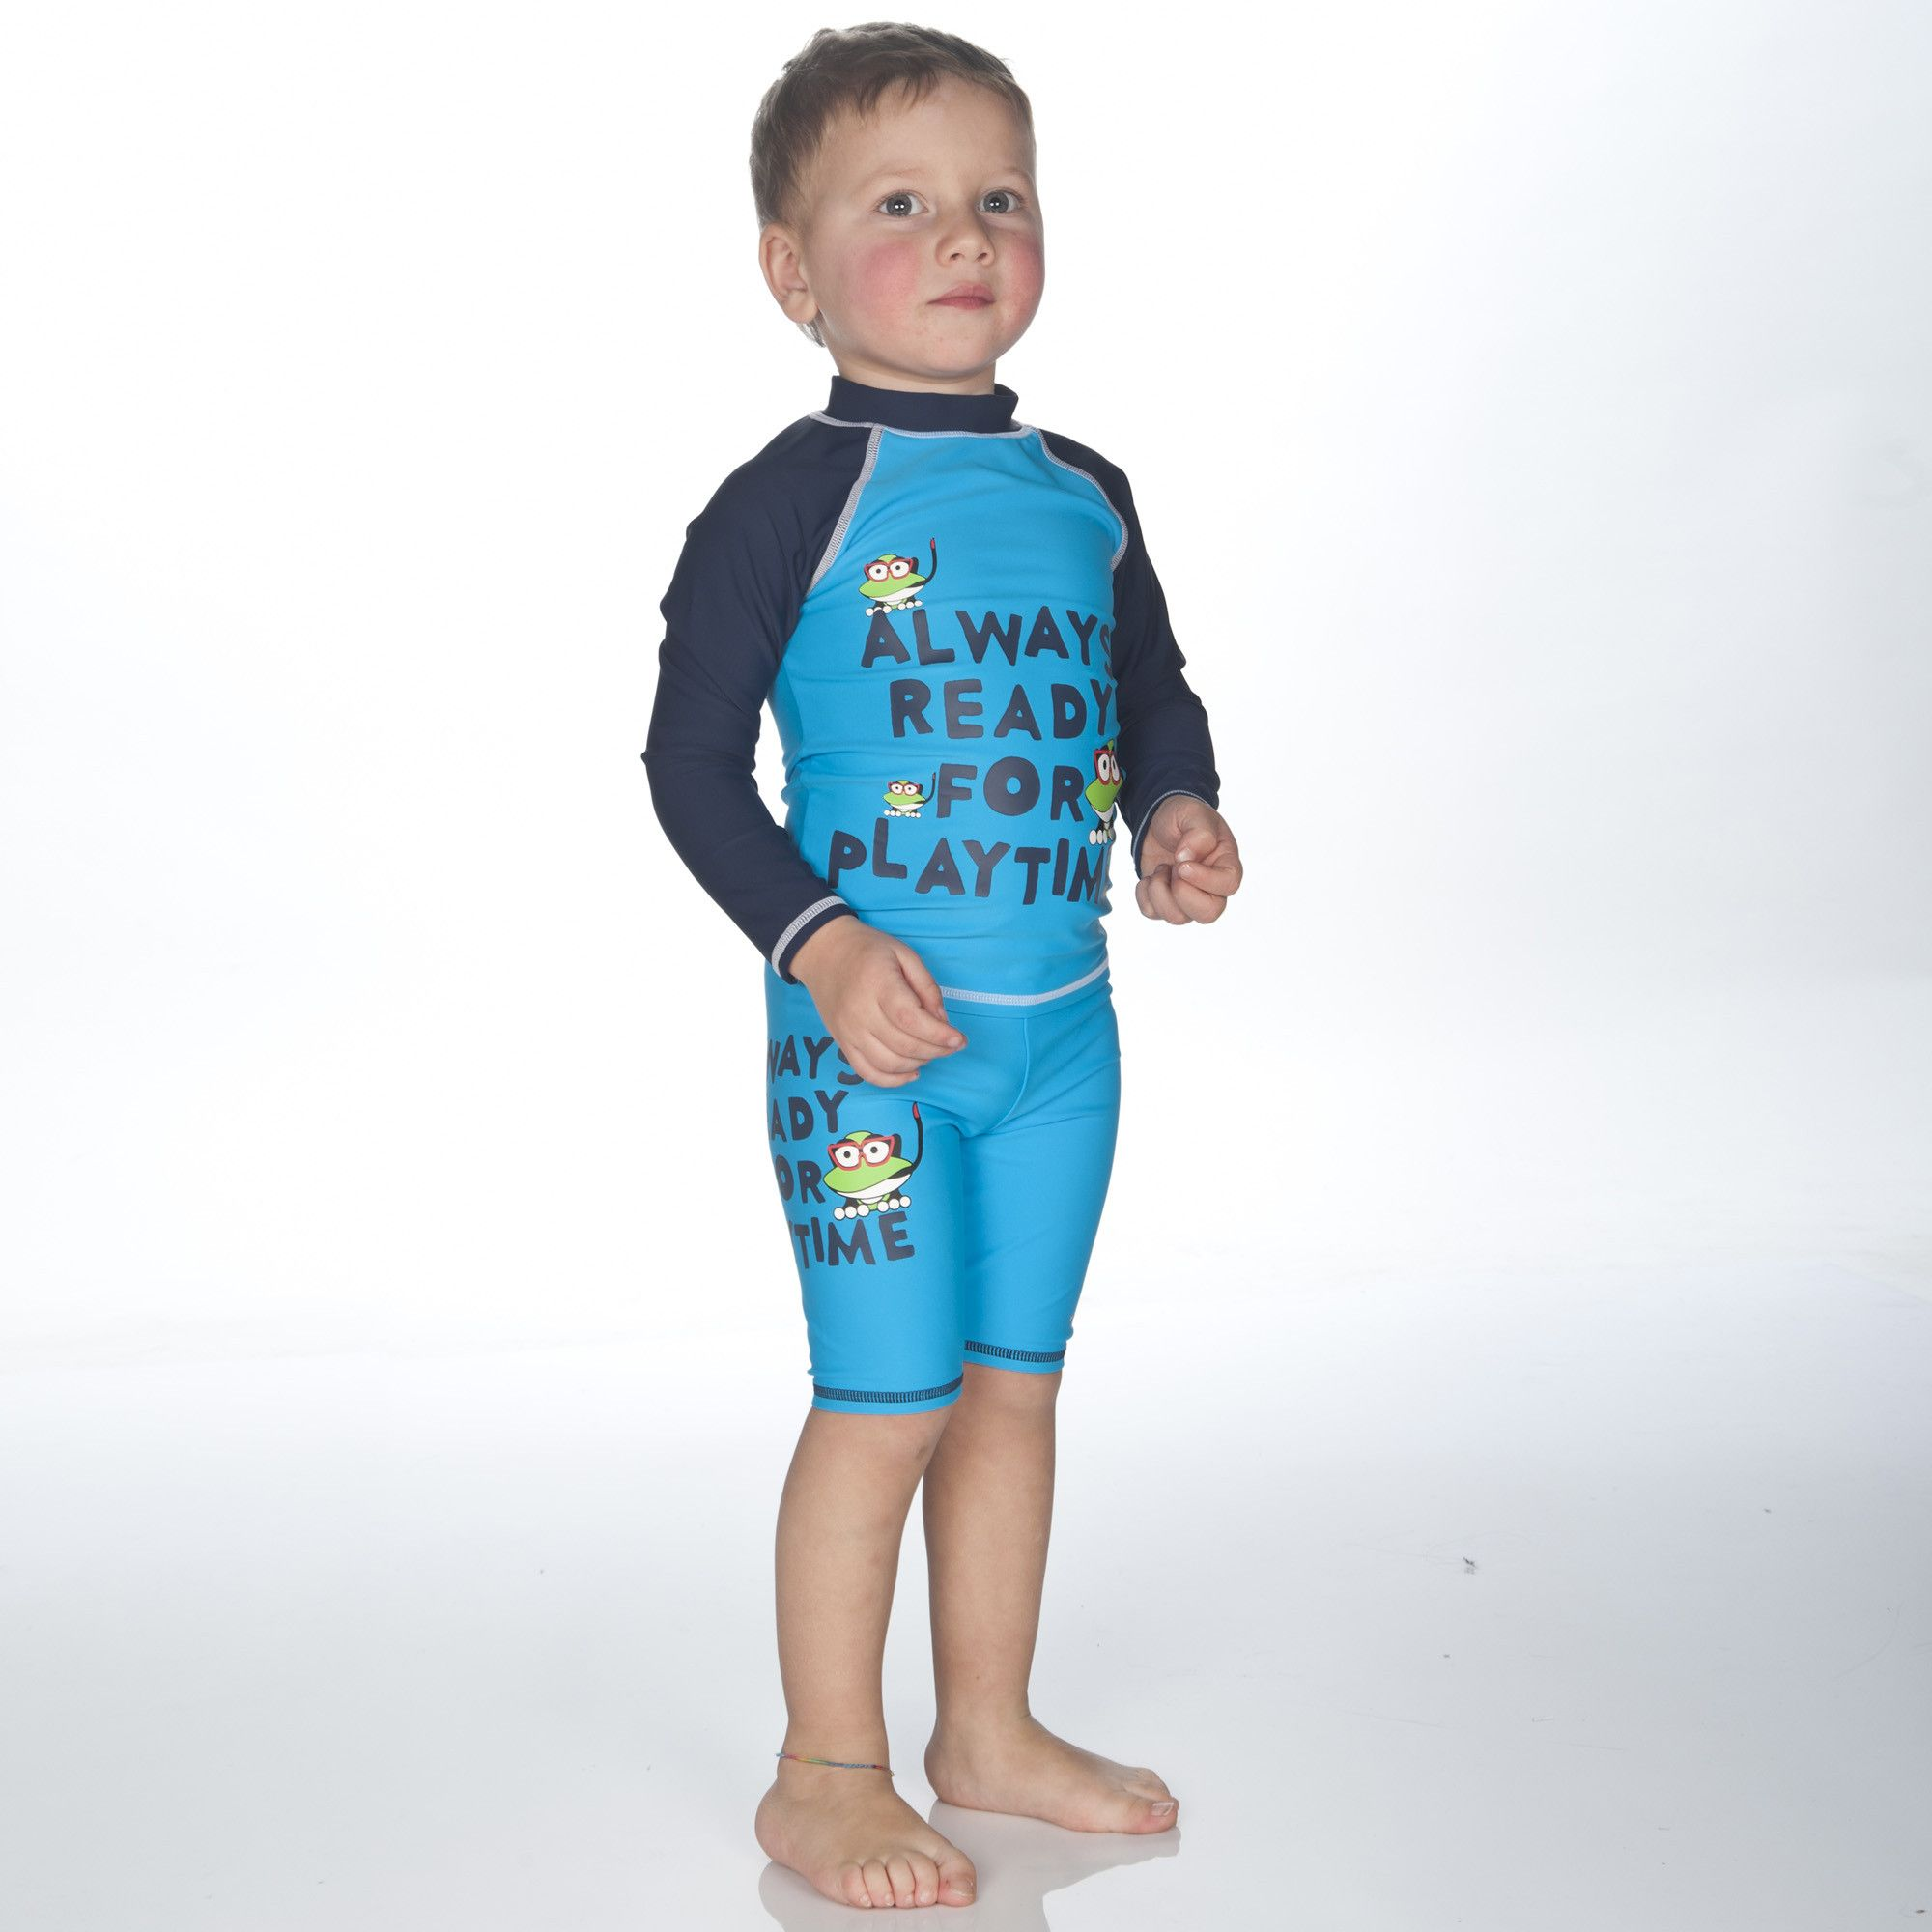 2363e7c9f35af Arena Water Tribe Kids Boy's UV Long Sleeve T-Shirt   SPORT   Kids ...